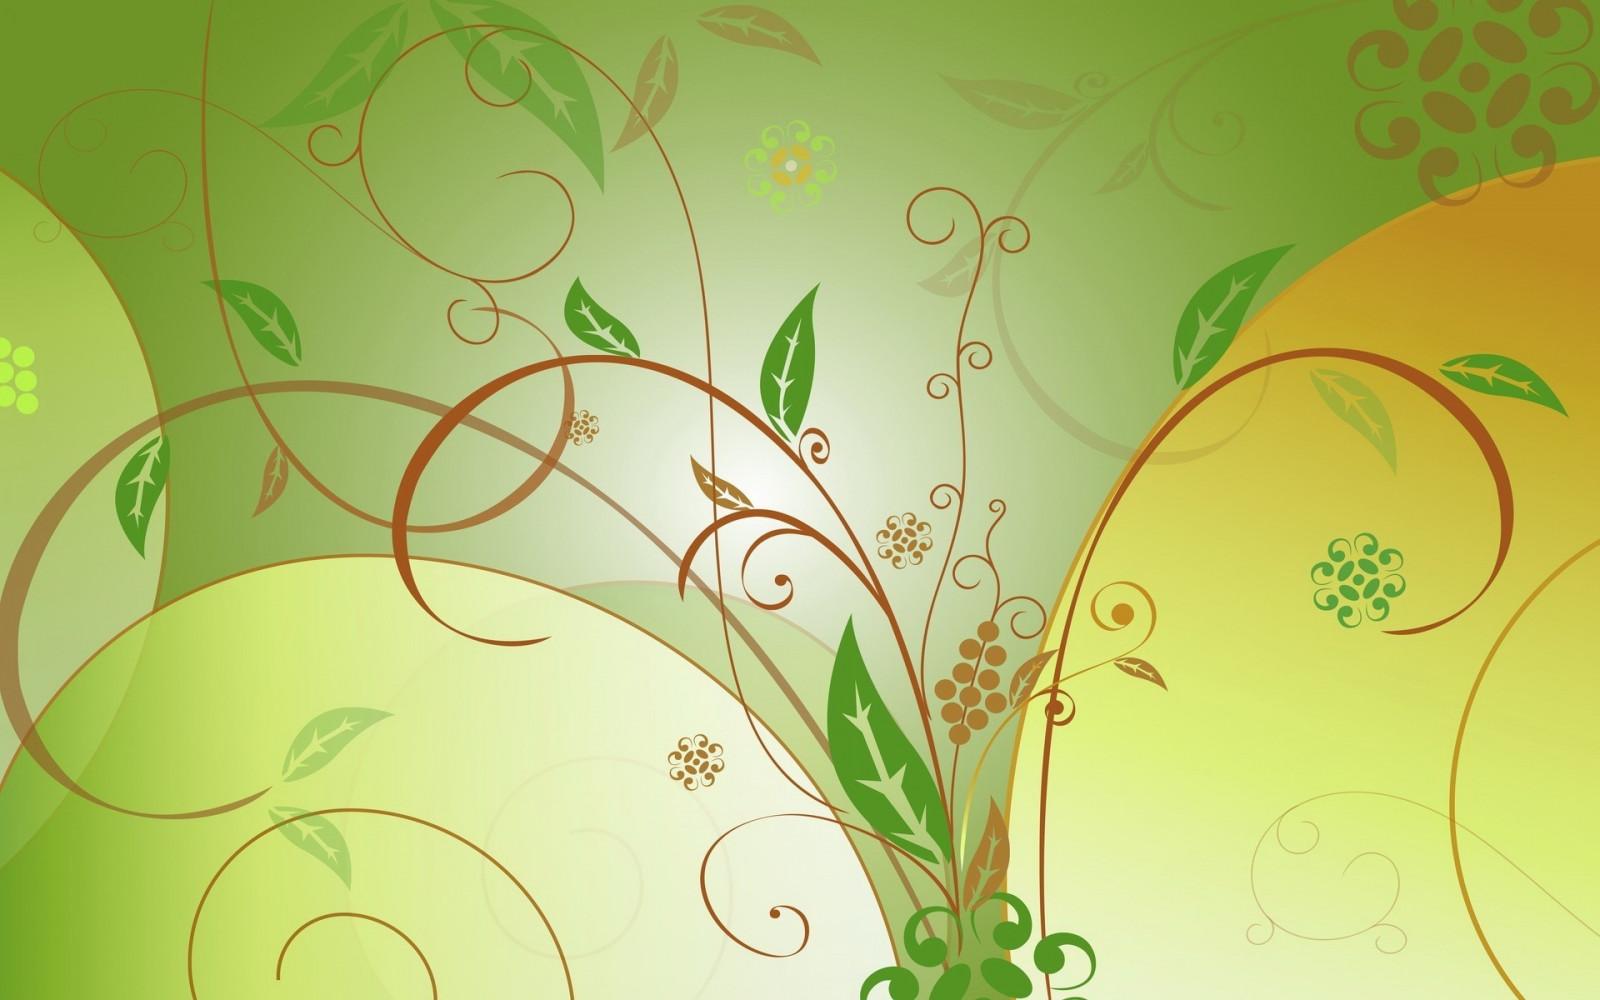 Wallpaper Drawing Leaves Illustration Grass Branch Green Pattern Circle Vector Art Leaf Flower Plant Background Flora Design Line Computer Wallpaper 1920x1200 4kwallpaper 694813 Hd Wallpapers Wallhere